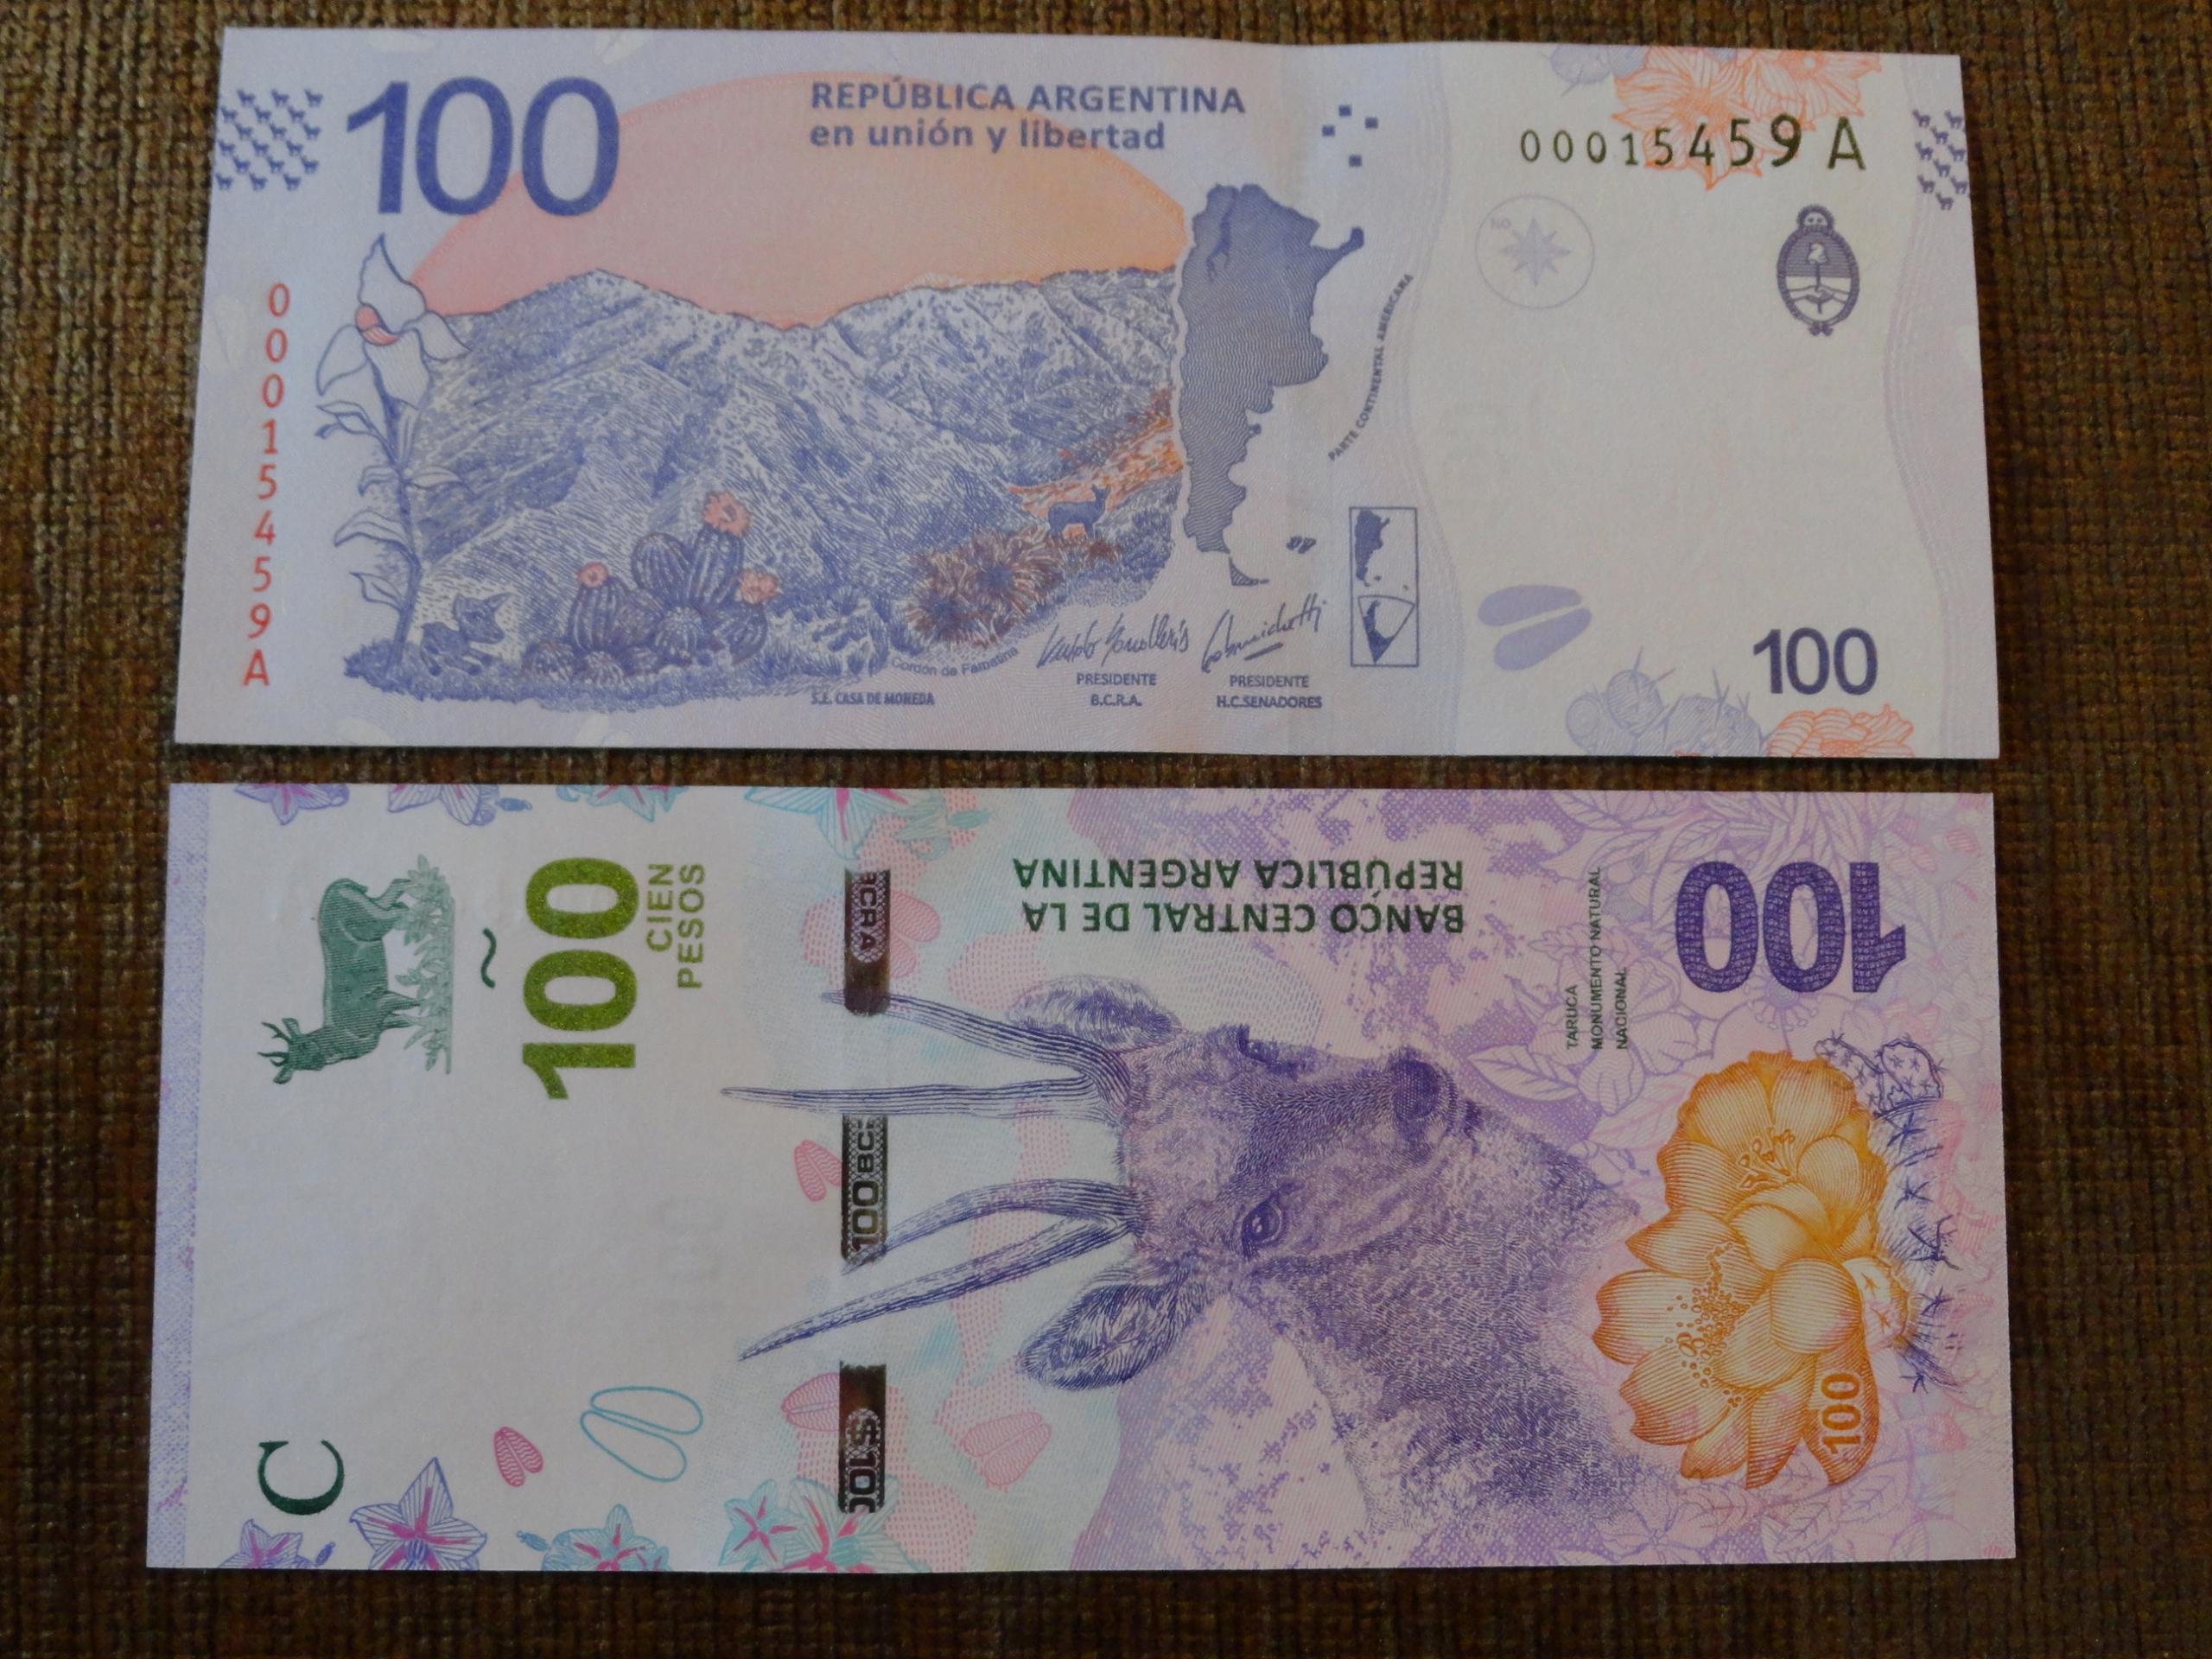 304.ARGENTYNA 100 PESO UNC